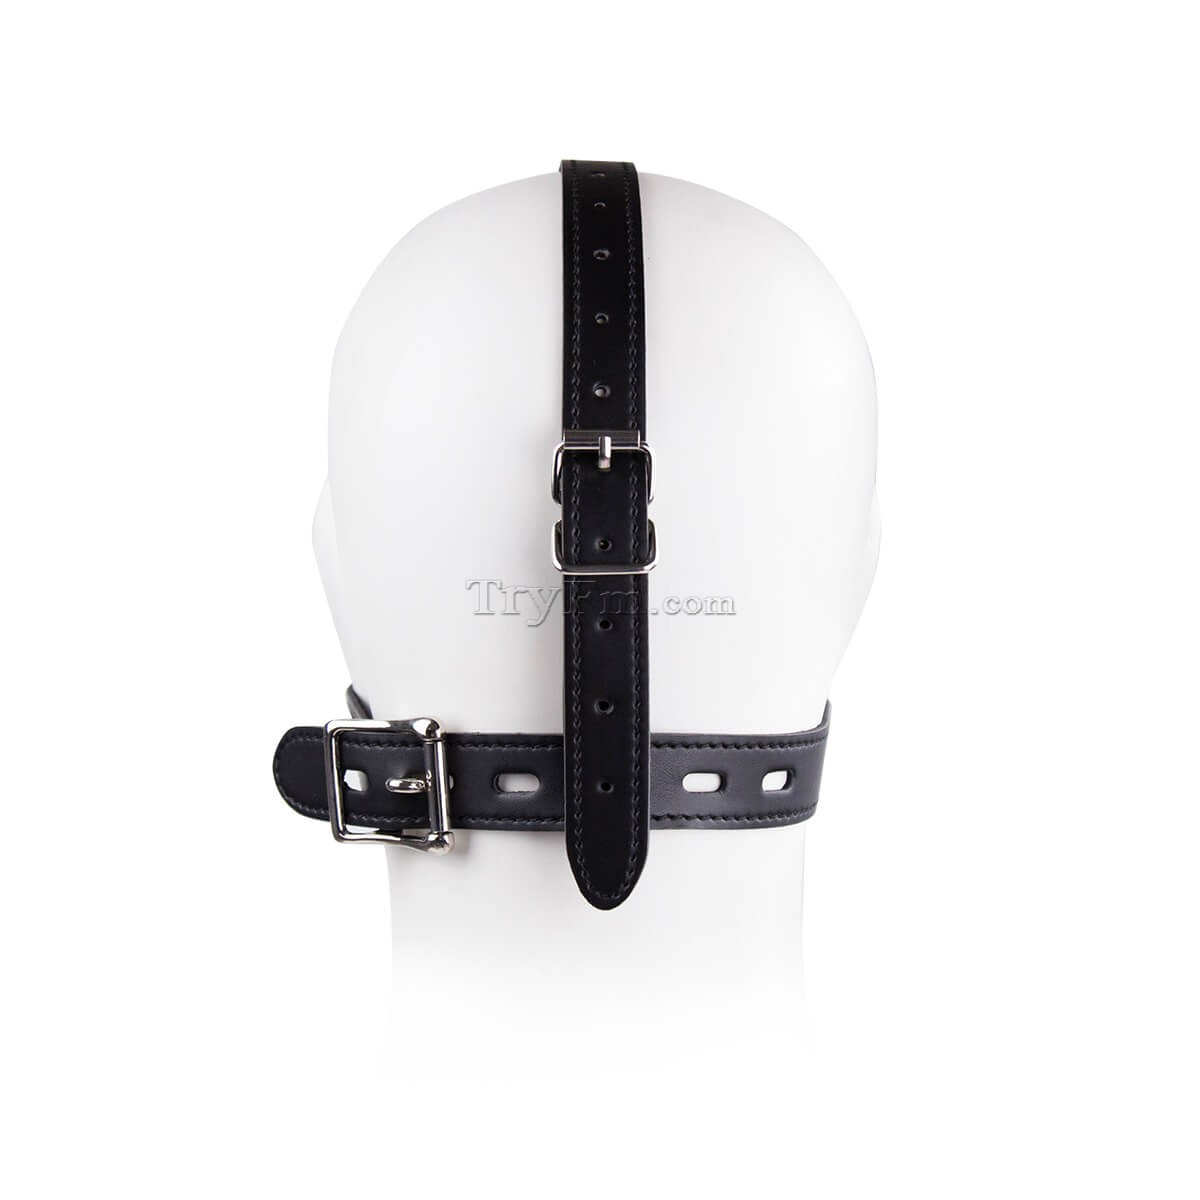 17-Plug-up-Leather-Head-Harness-Mouth-Gag-9.jpg